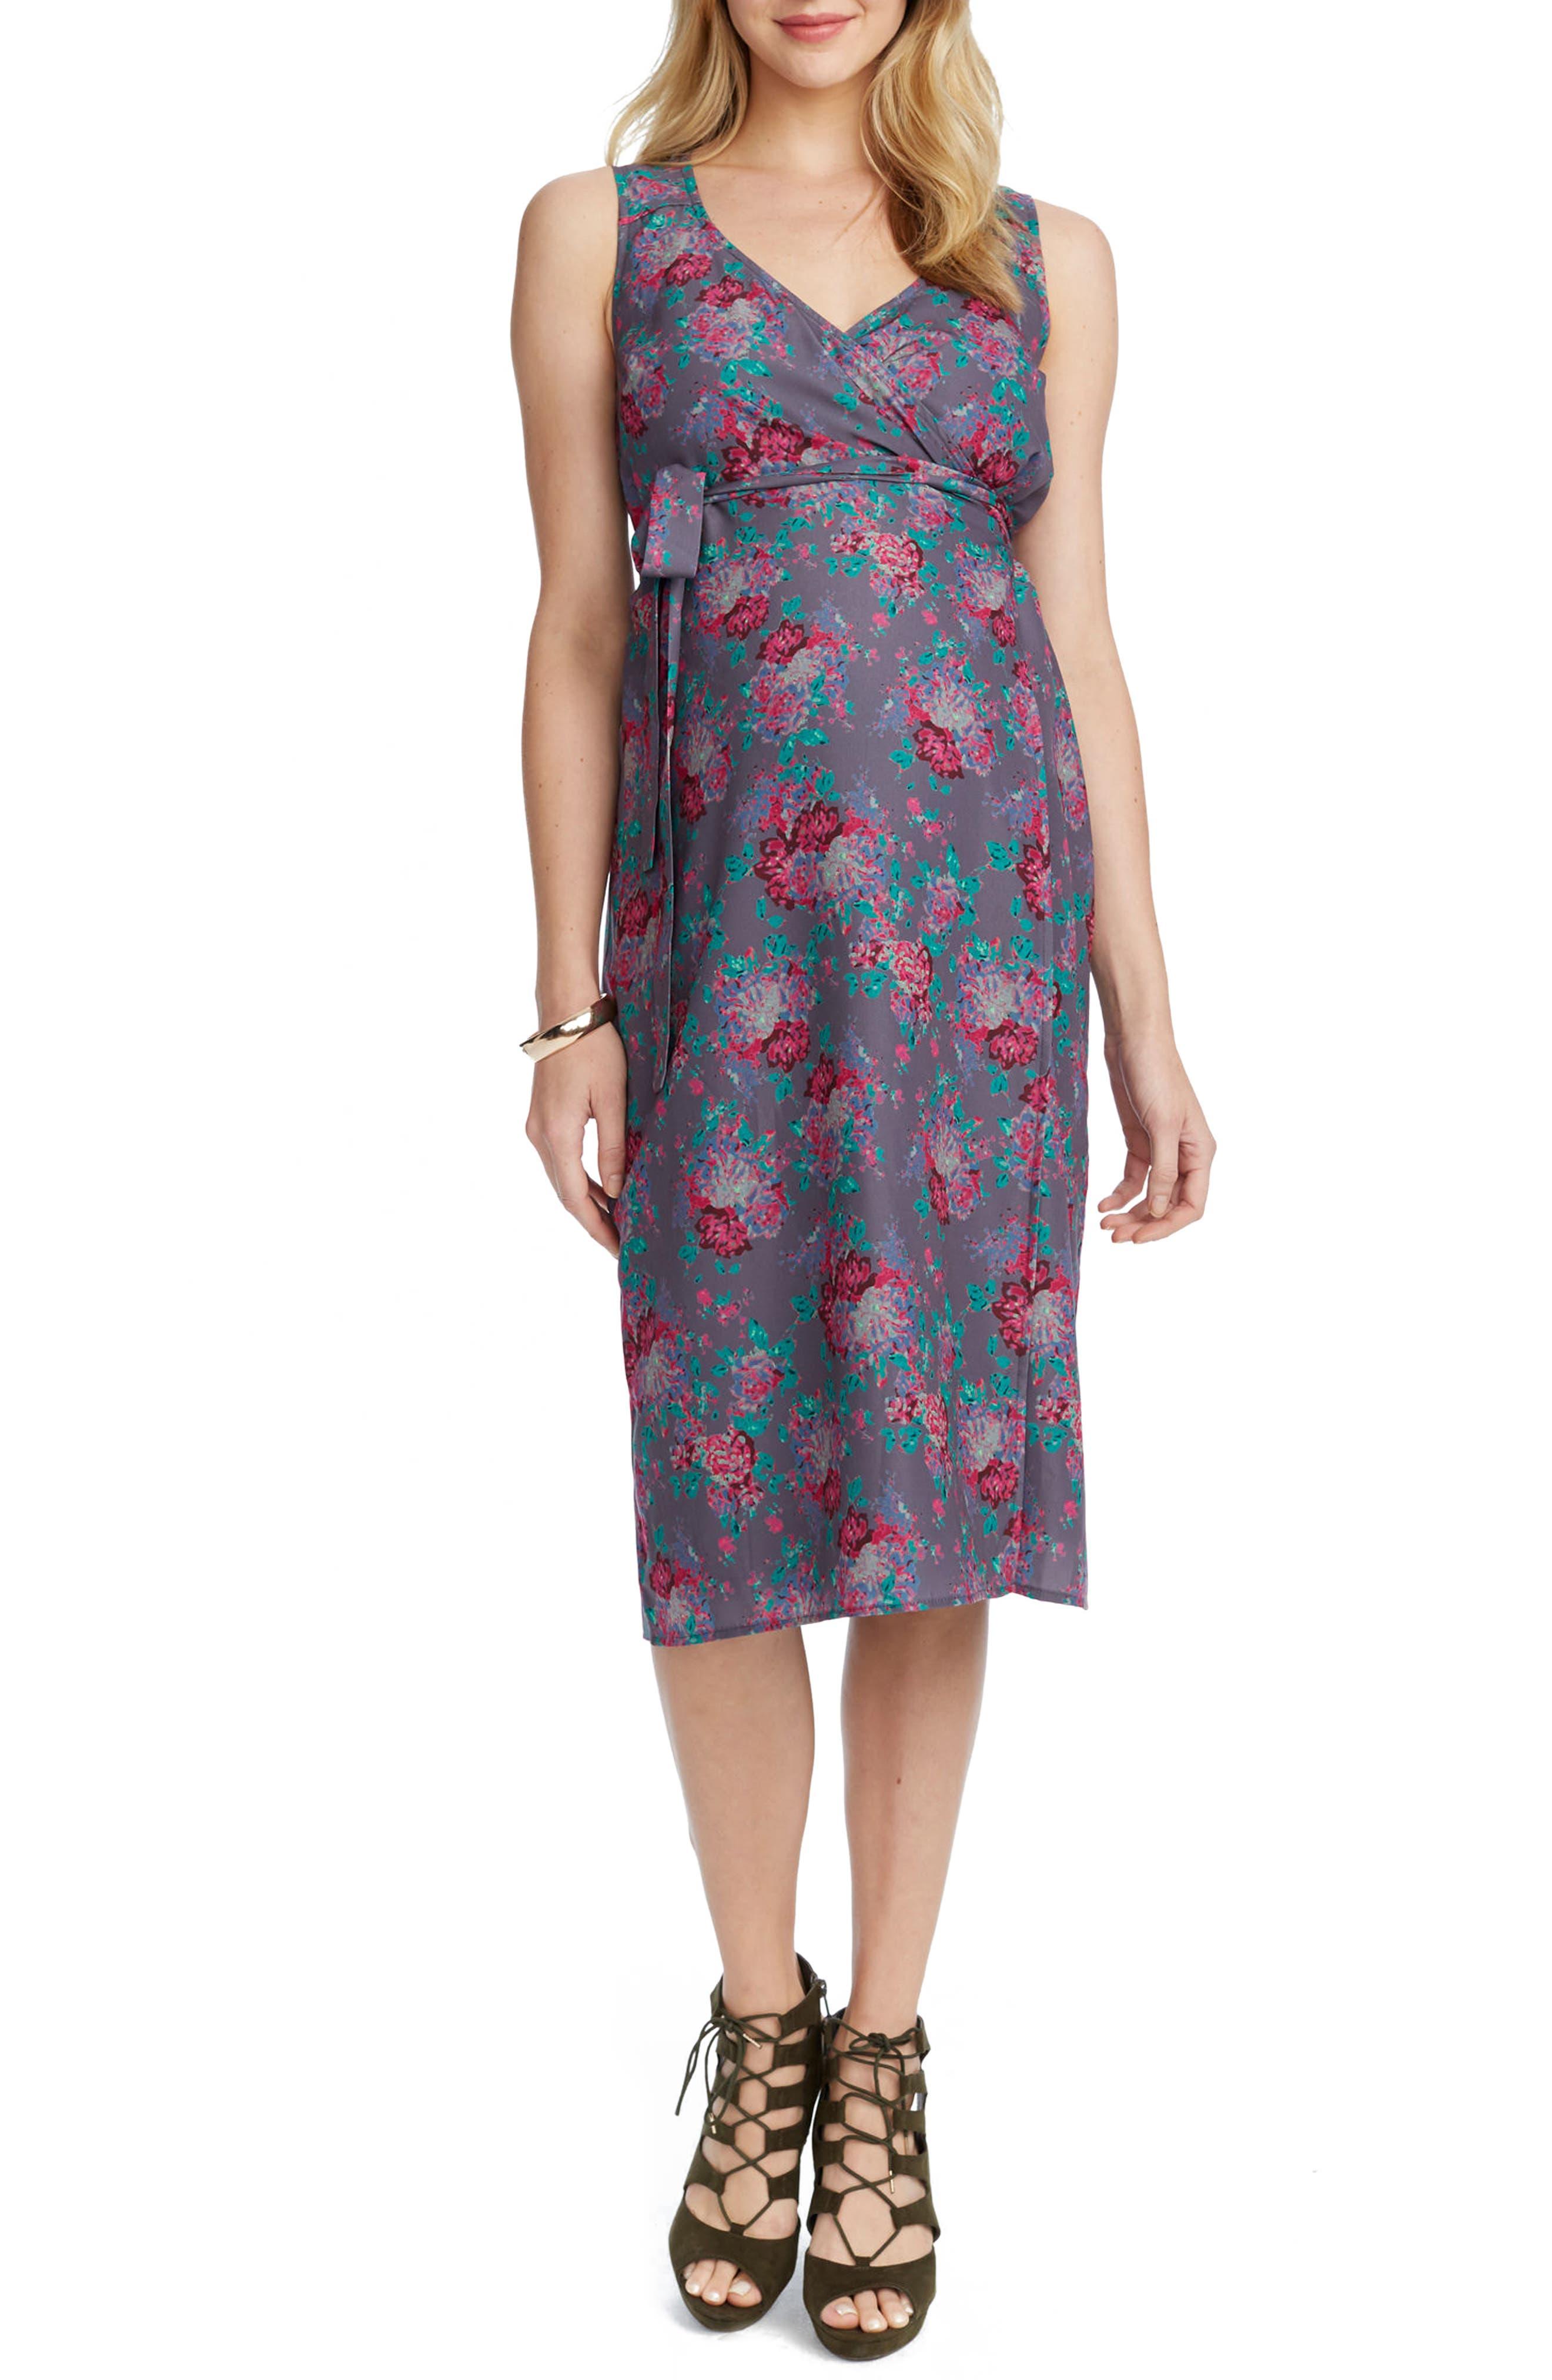 Rosie Pope Tara Floral Maternity/nursing Wrap Dress